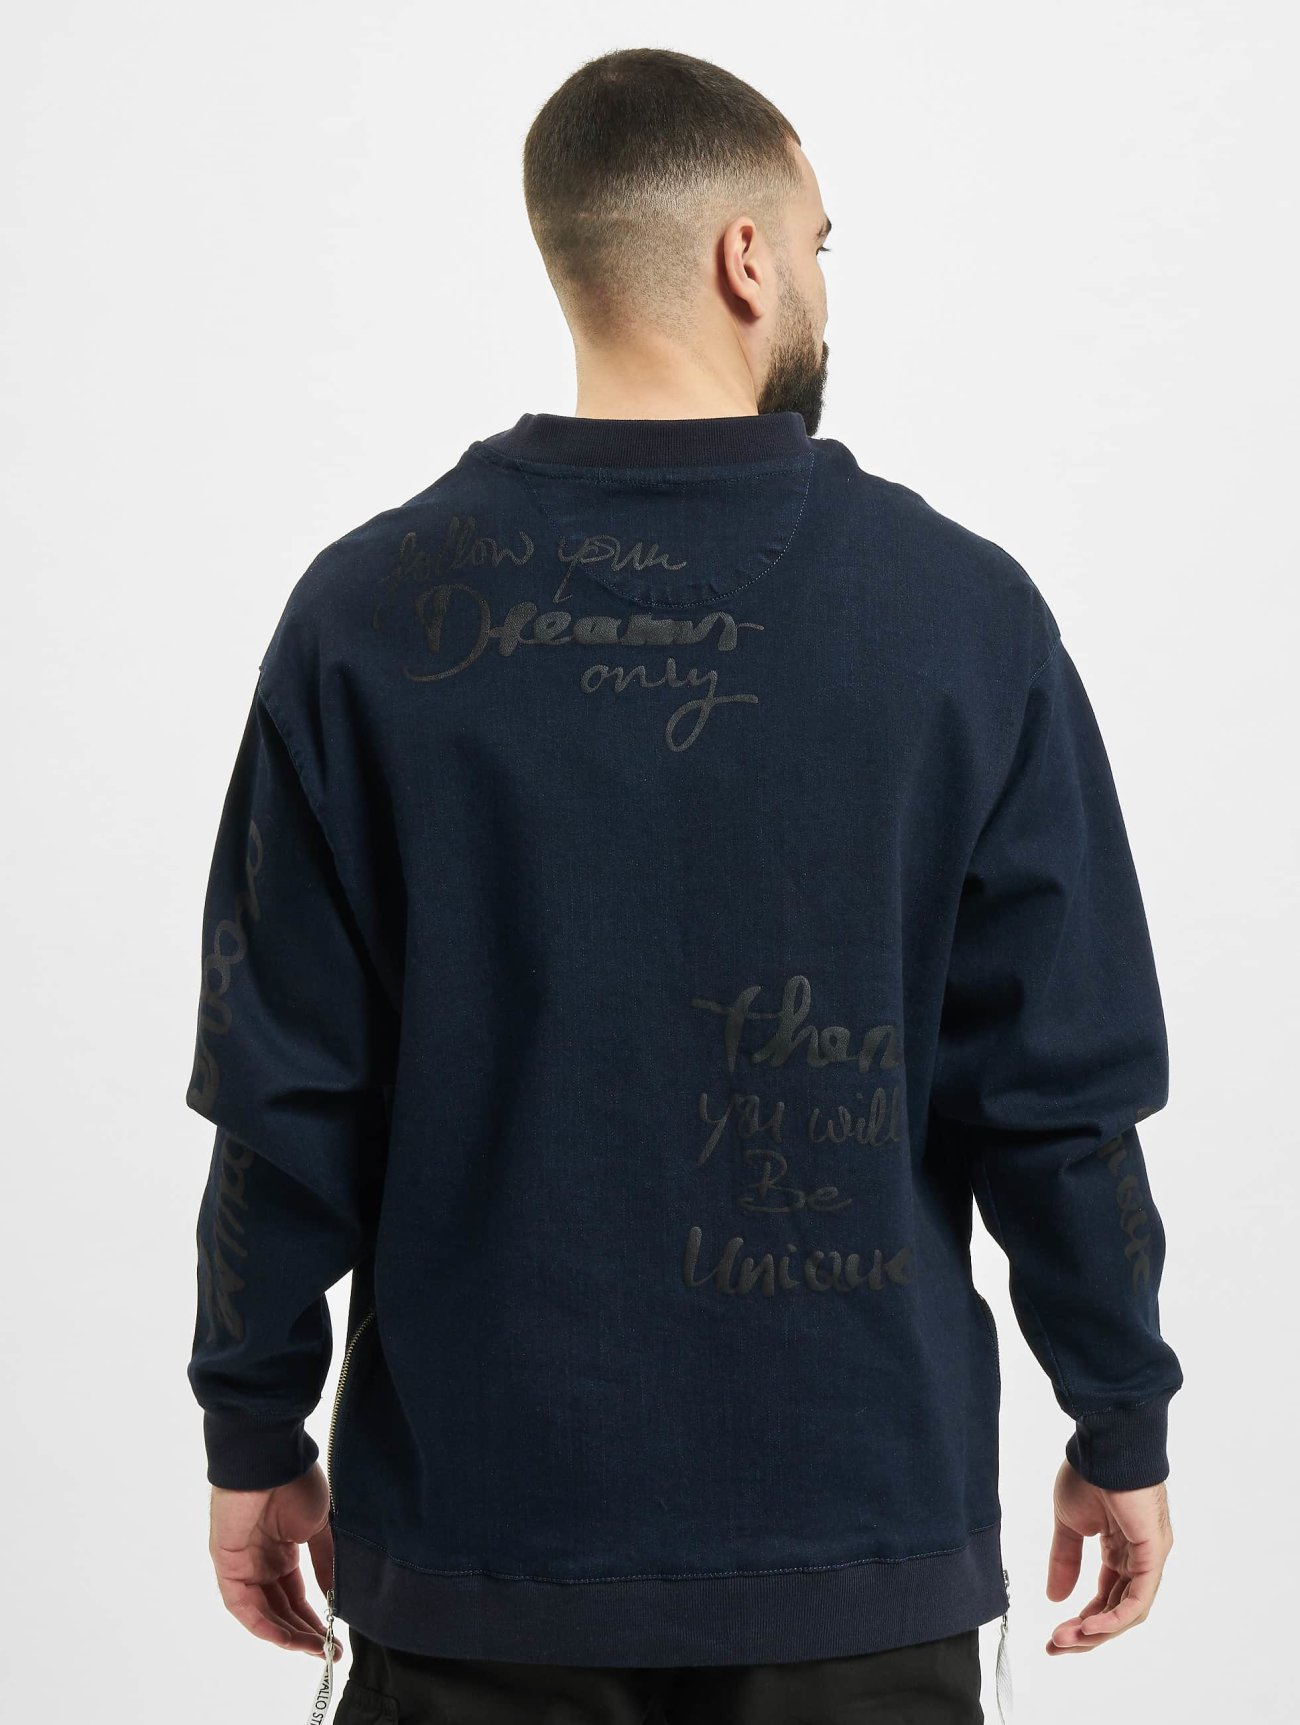 De Ferro   Denim  bleu Homme Sweat & Pull  391191  Homme Hauts